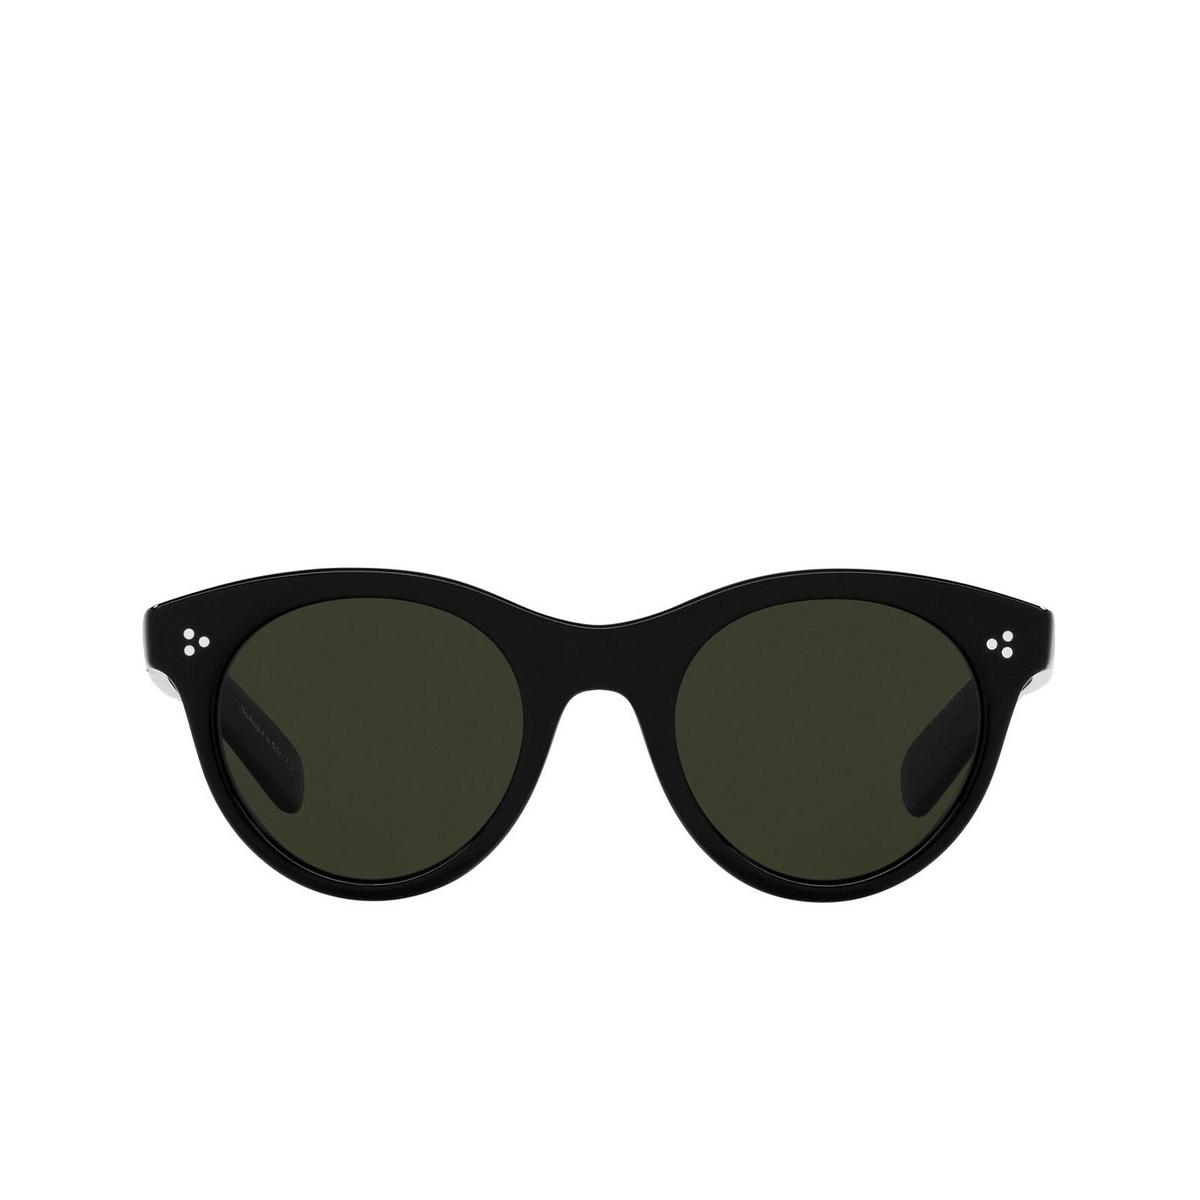 Oliver Peoples® Round Sunglasses: Merrivale OV5451SU color Black 1005P1 - front view.